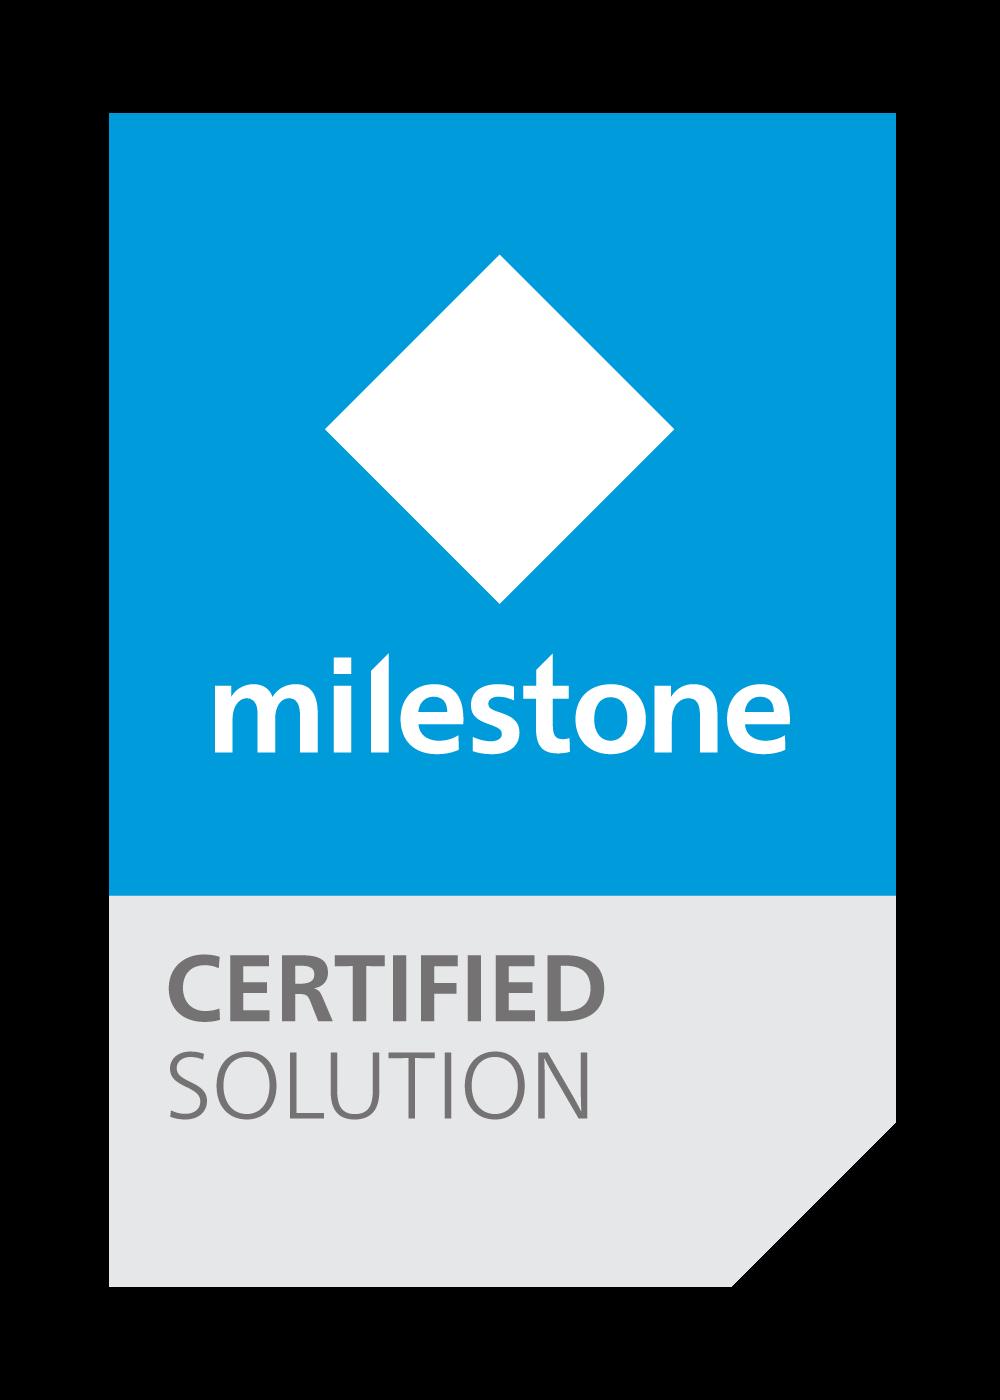 milestone certified solution